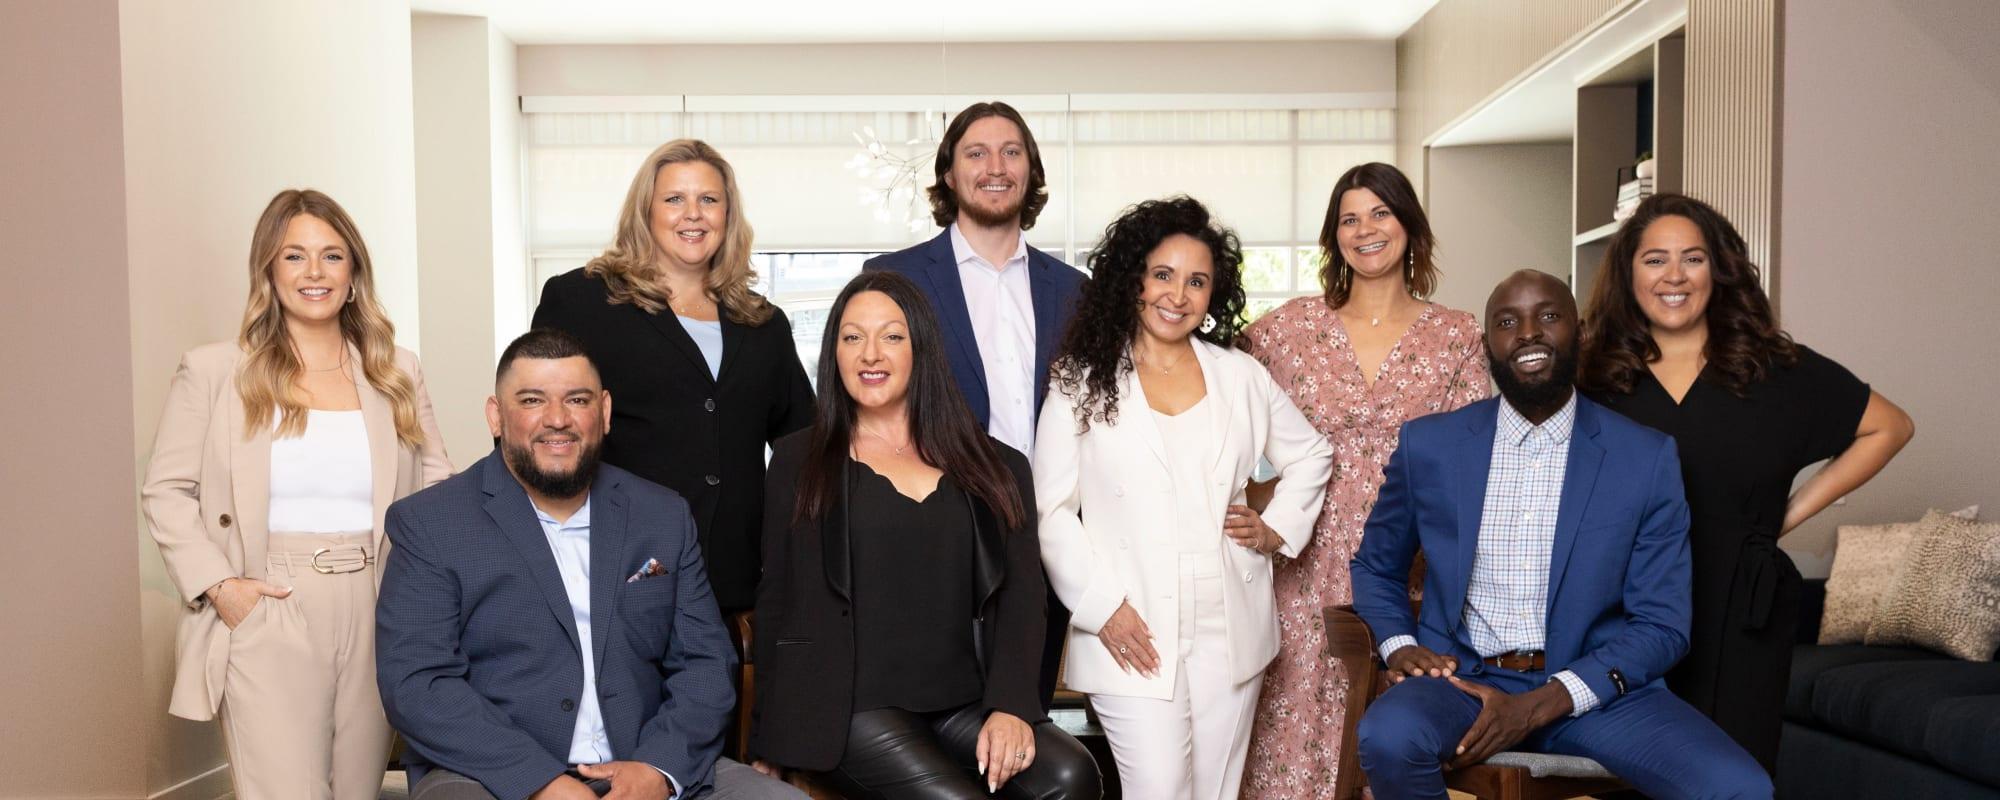 Our team at CREA Management in Austin, Texas